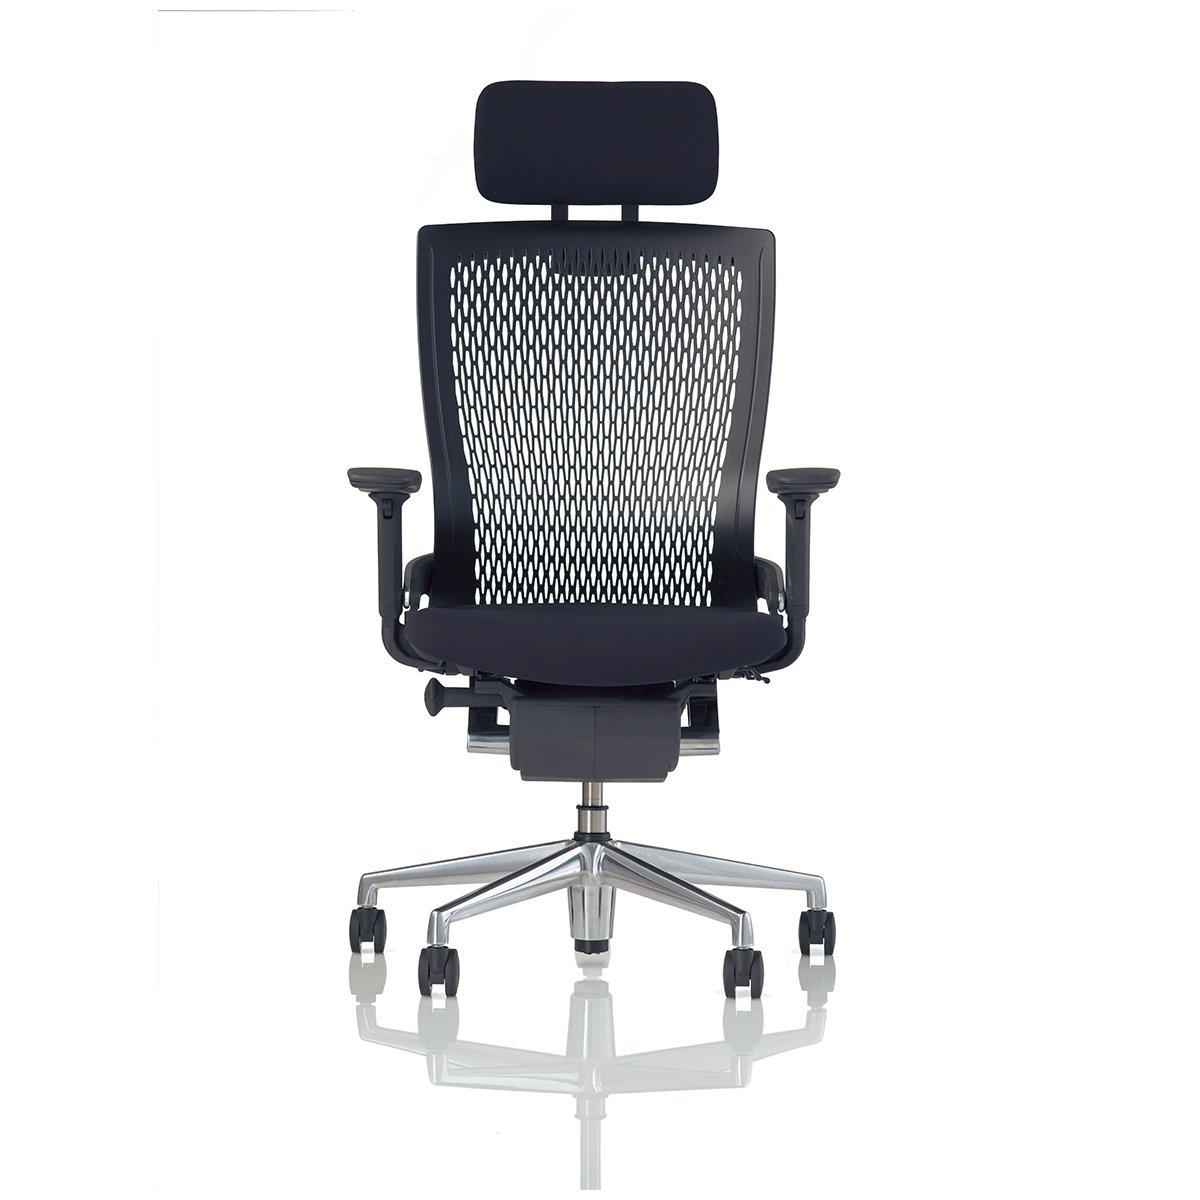 leadshine pulse 日本进口 电脑椅 高背椅办公椅子 黑色带头枕 日本